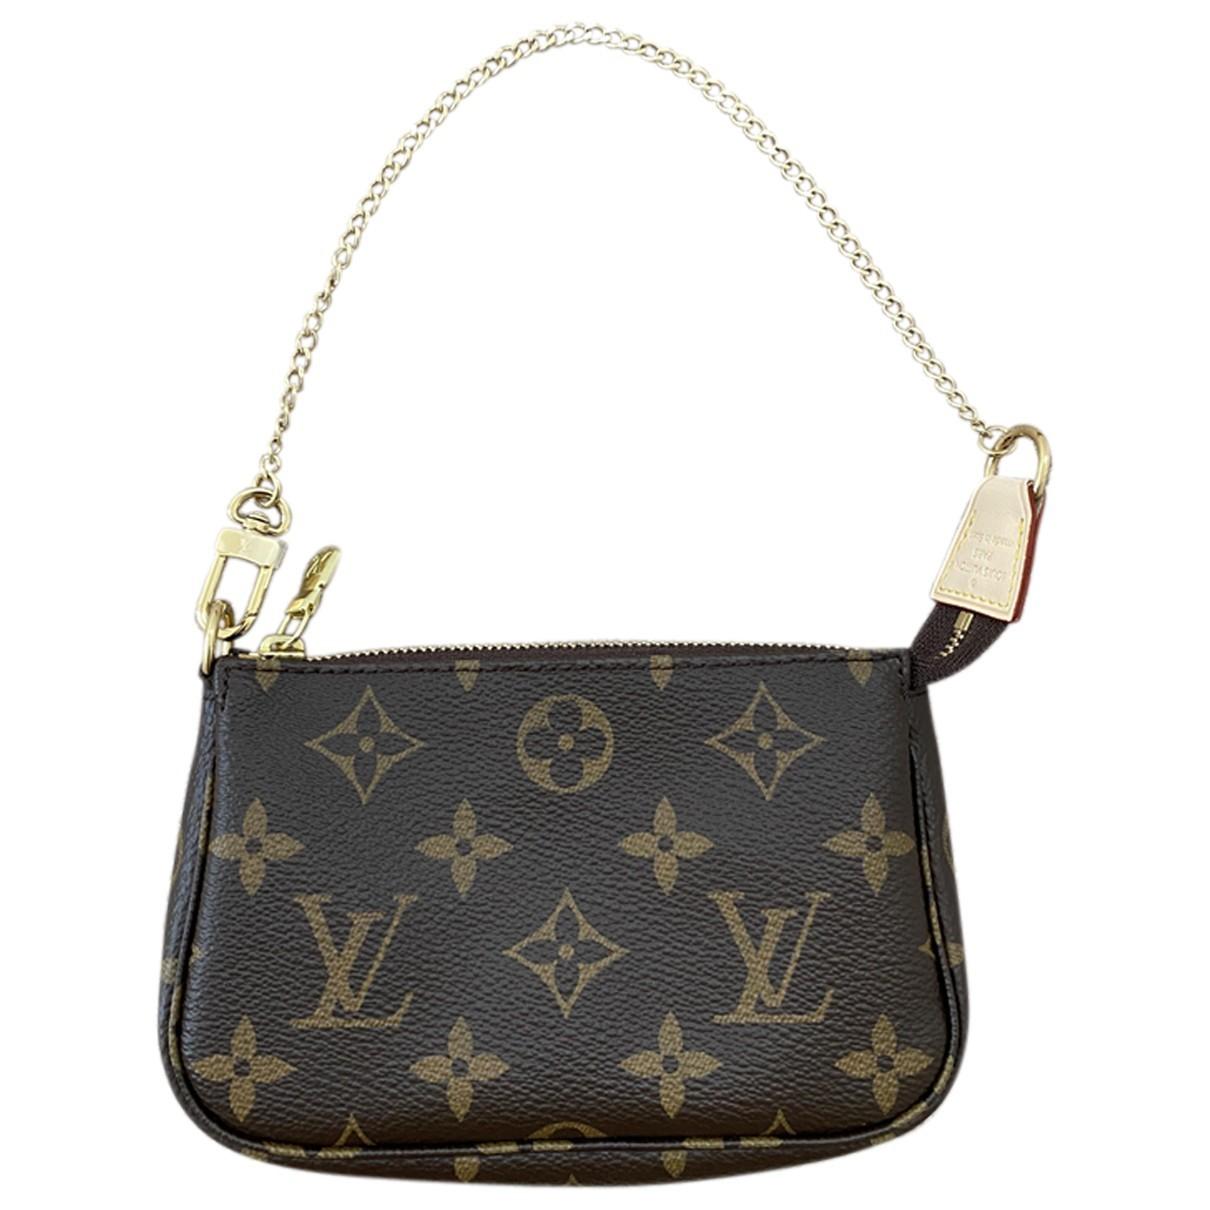 Louis Vuitton Pochette Accessoire Brown Cloth Clutch bag for Women N